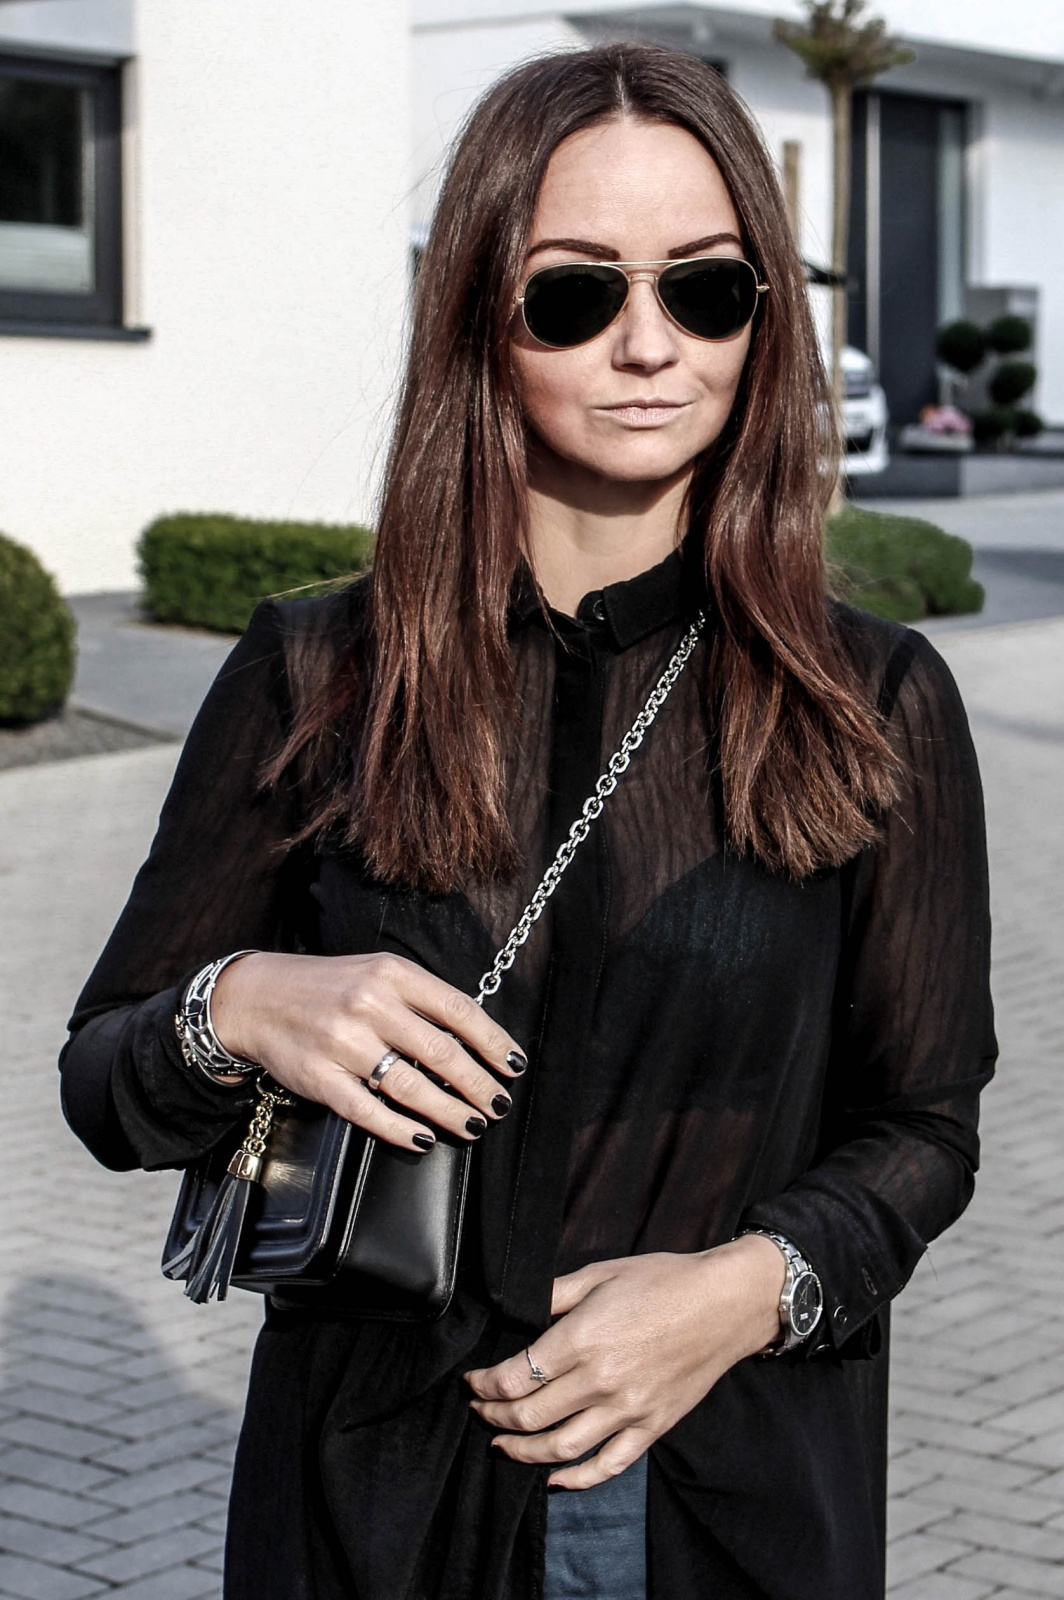 Fashioncircuz by Jenny dalli_caps_waschmittel_fashioncircuz_jennifer__blogger_perlen_portrait_trend_trendcheck_II-1064x1600 Dalli Trendcheck II - PERLEN